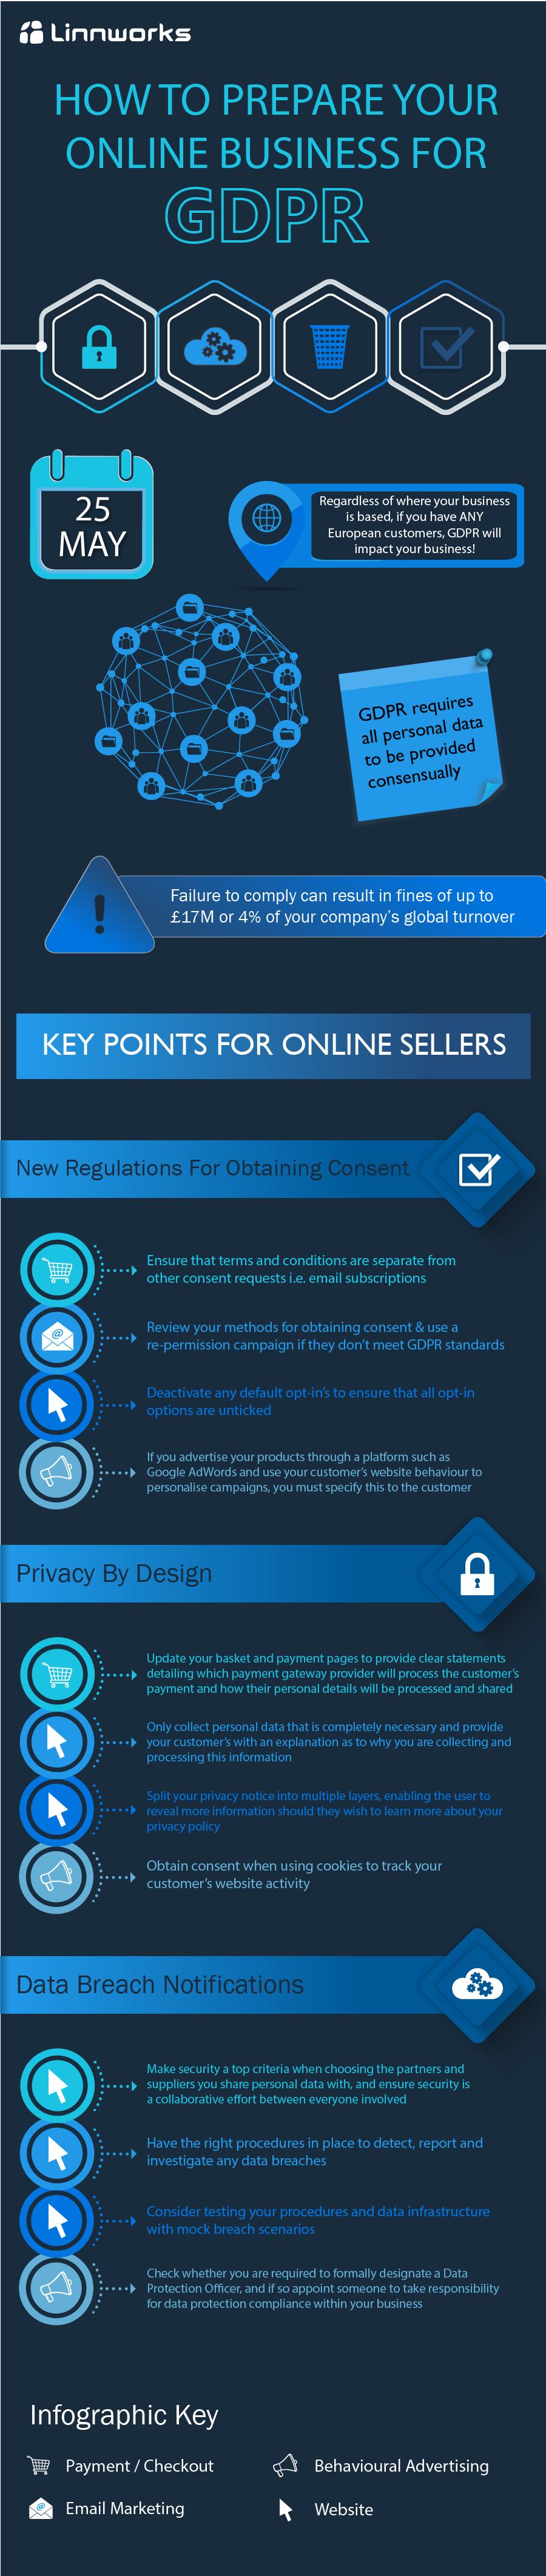 GDPR Infographic Linnworks